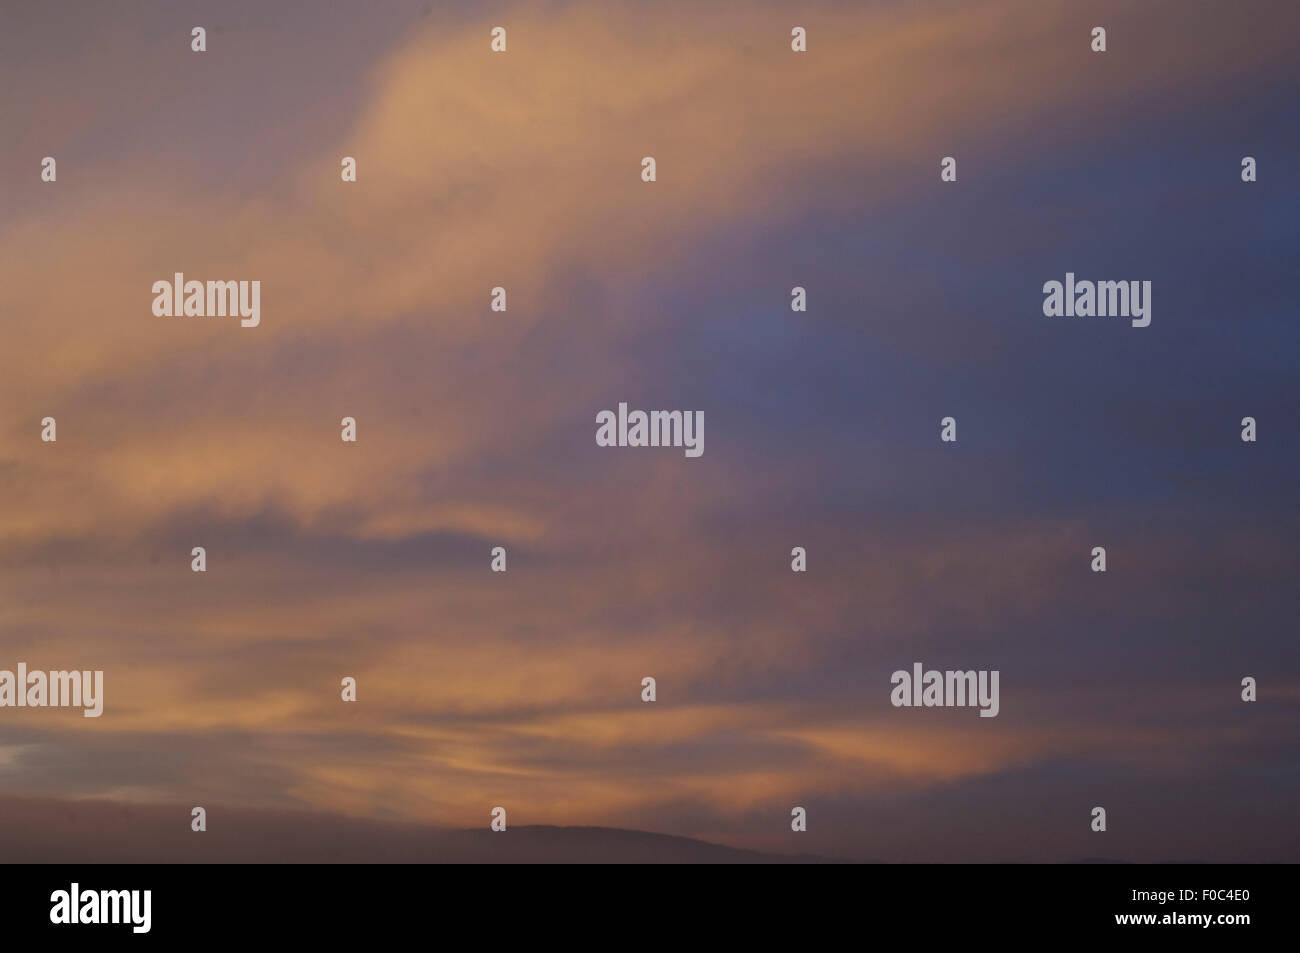 Morgenroete, Impression, Morgenstimmung, - Stock Image